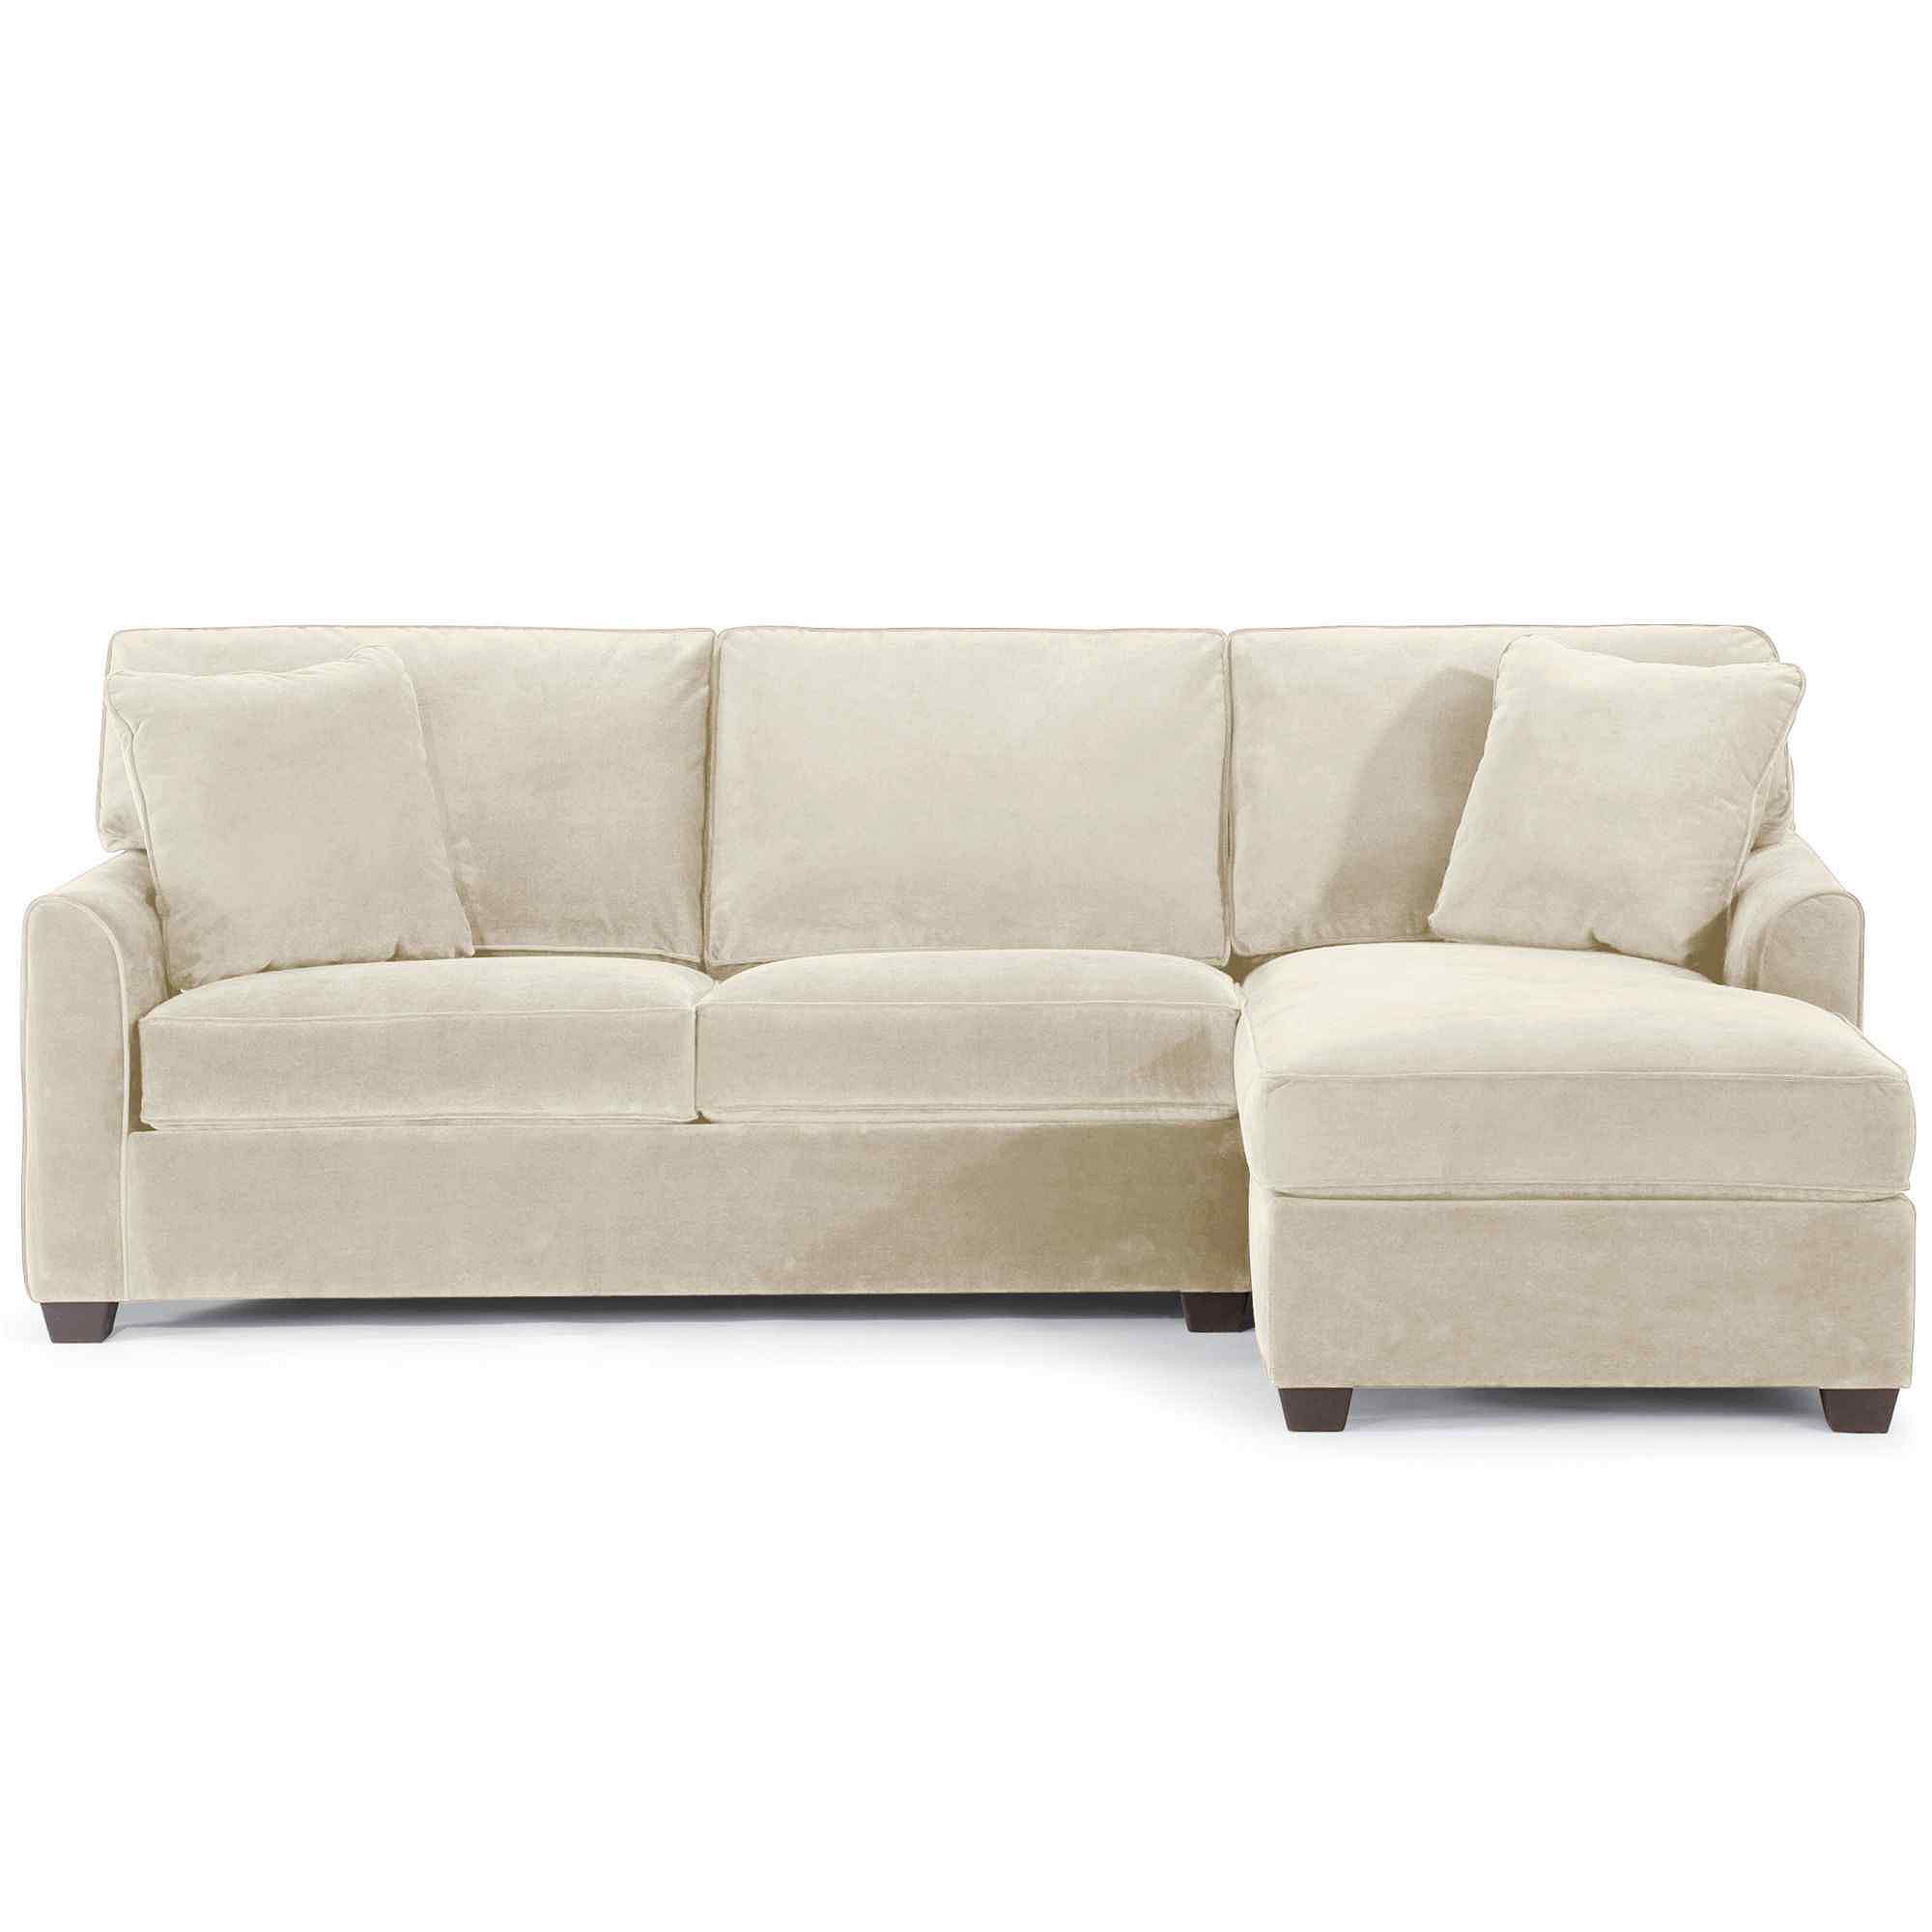 upc 079744360190 fabric possibilities sharkfin arm 2 pc. Black Bedroom Furniture Sets. Home Design Ideas